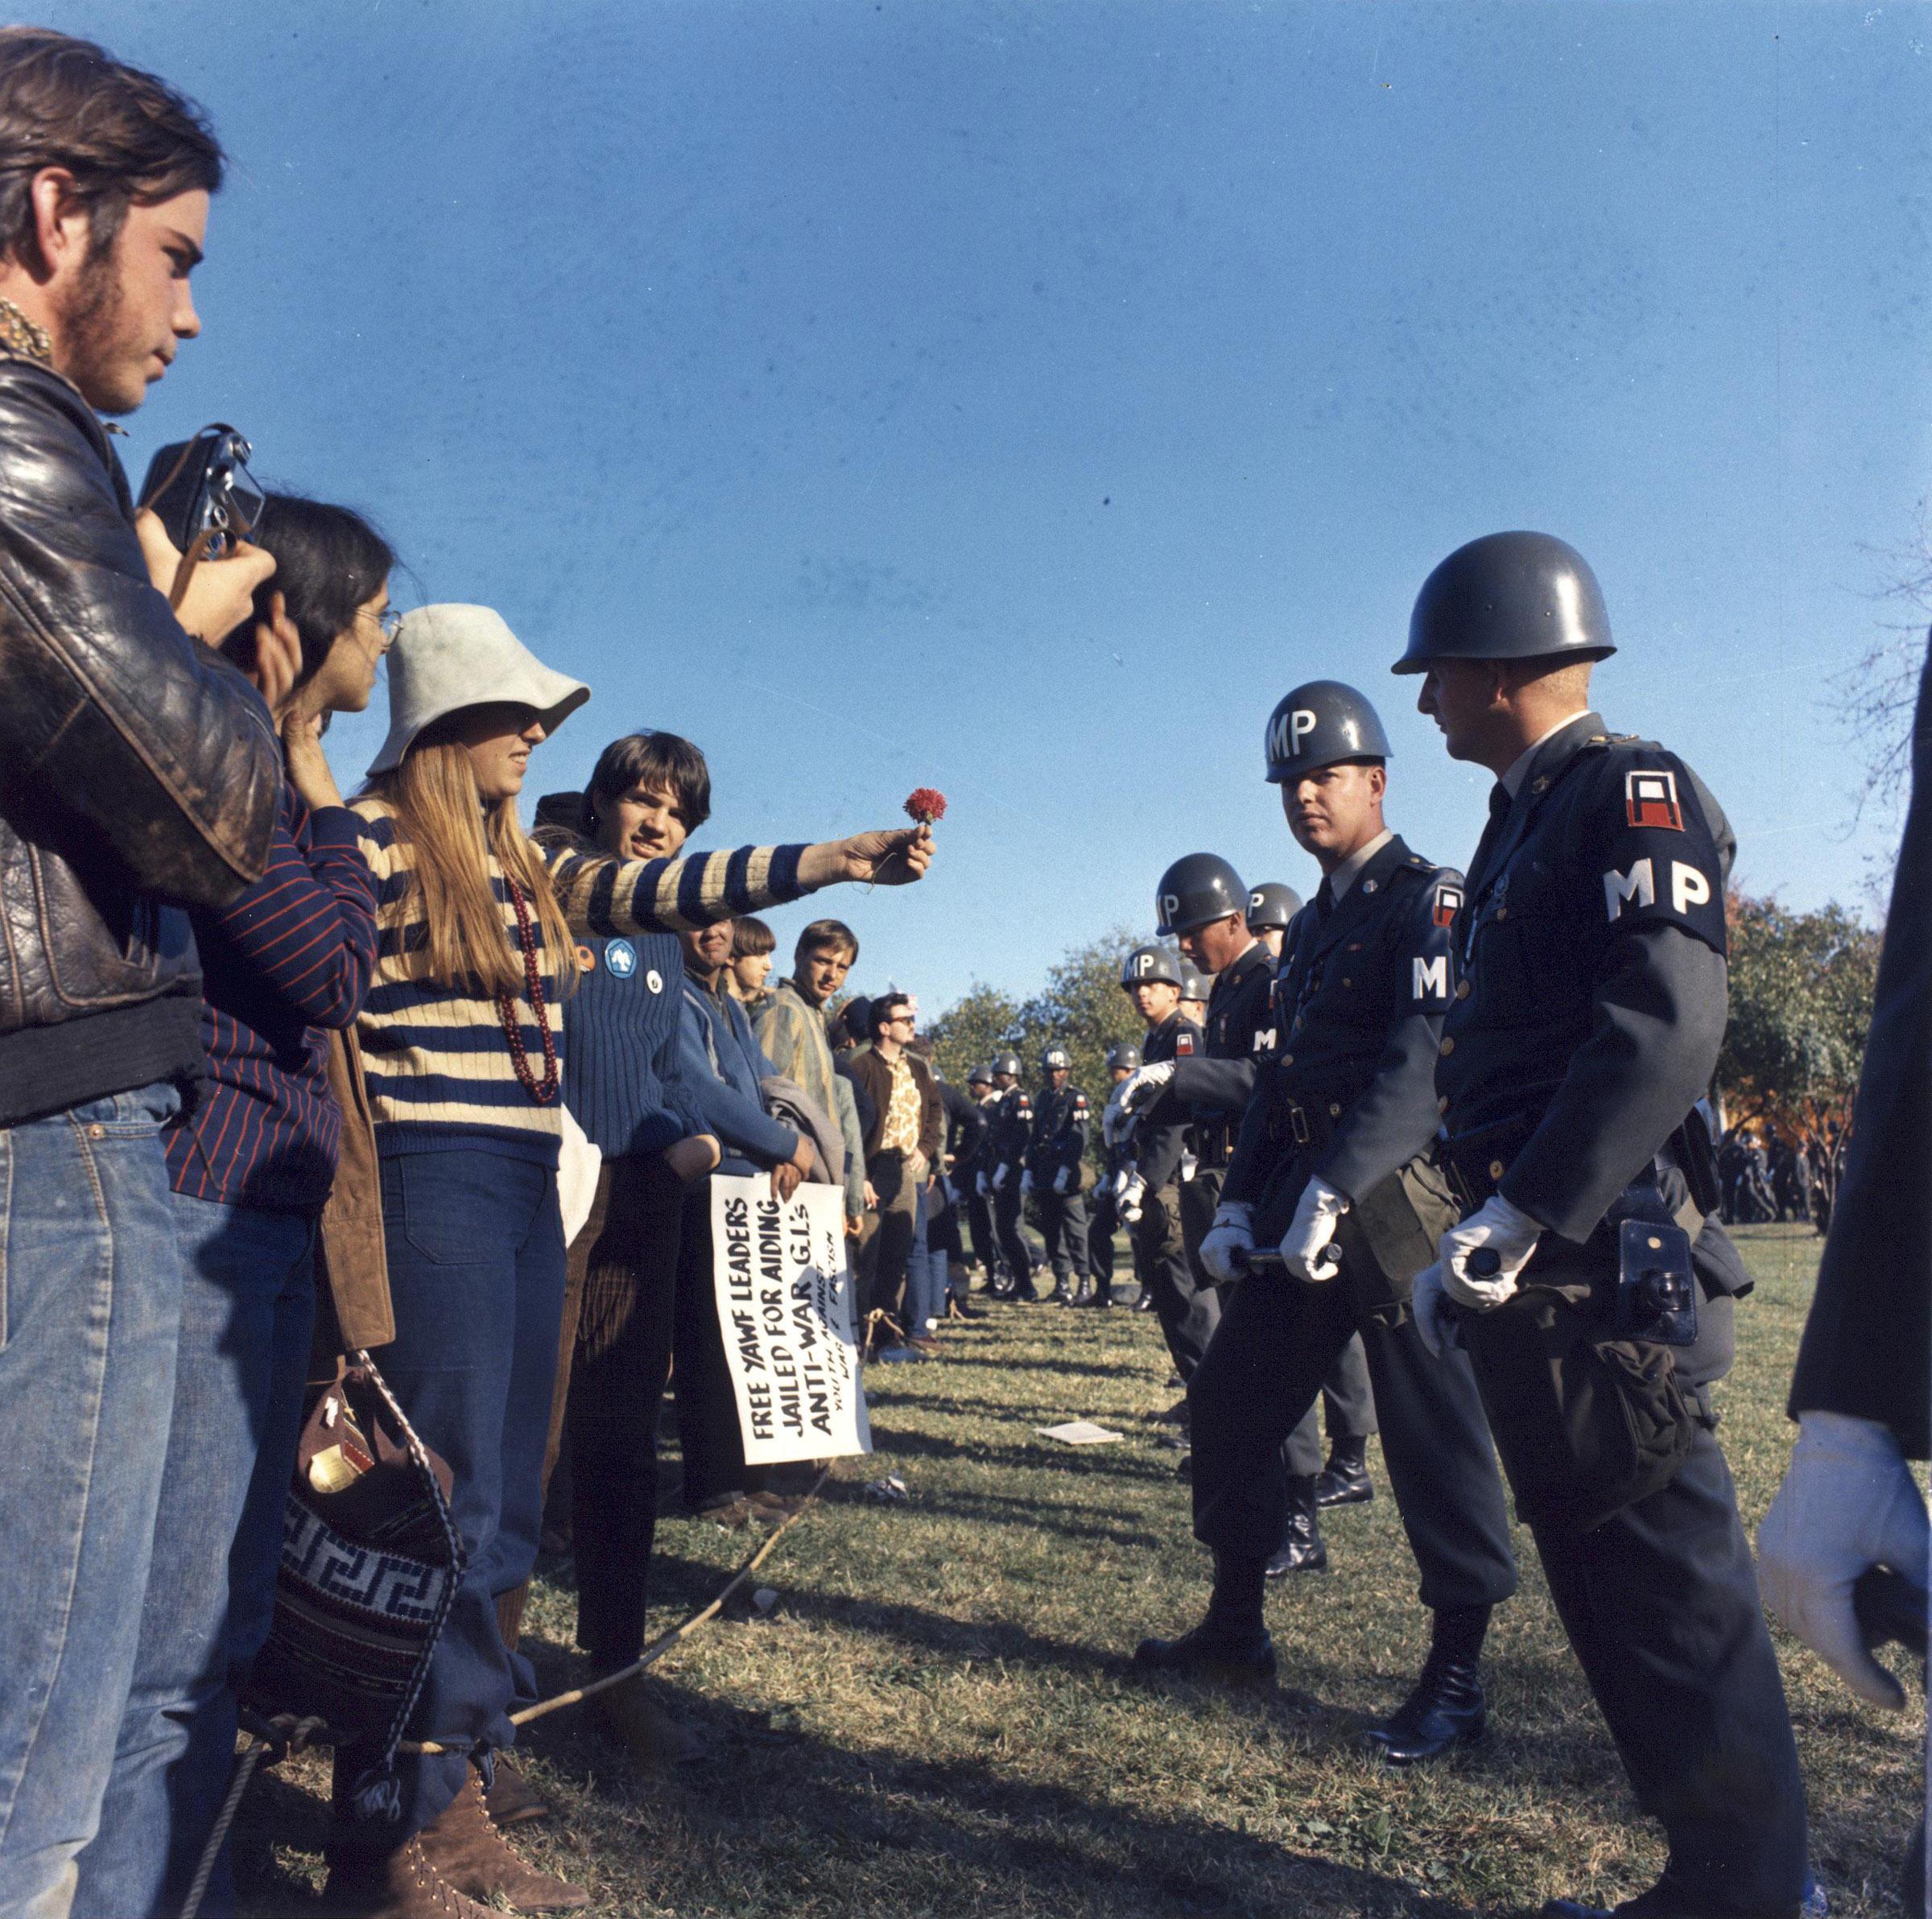 21 oktober 1967. Foto:S.Sgt. Albert R. Simpson, Wikimedia Commons.